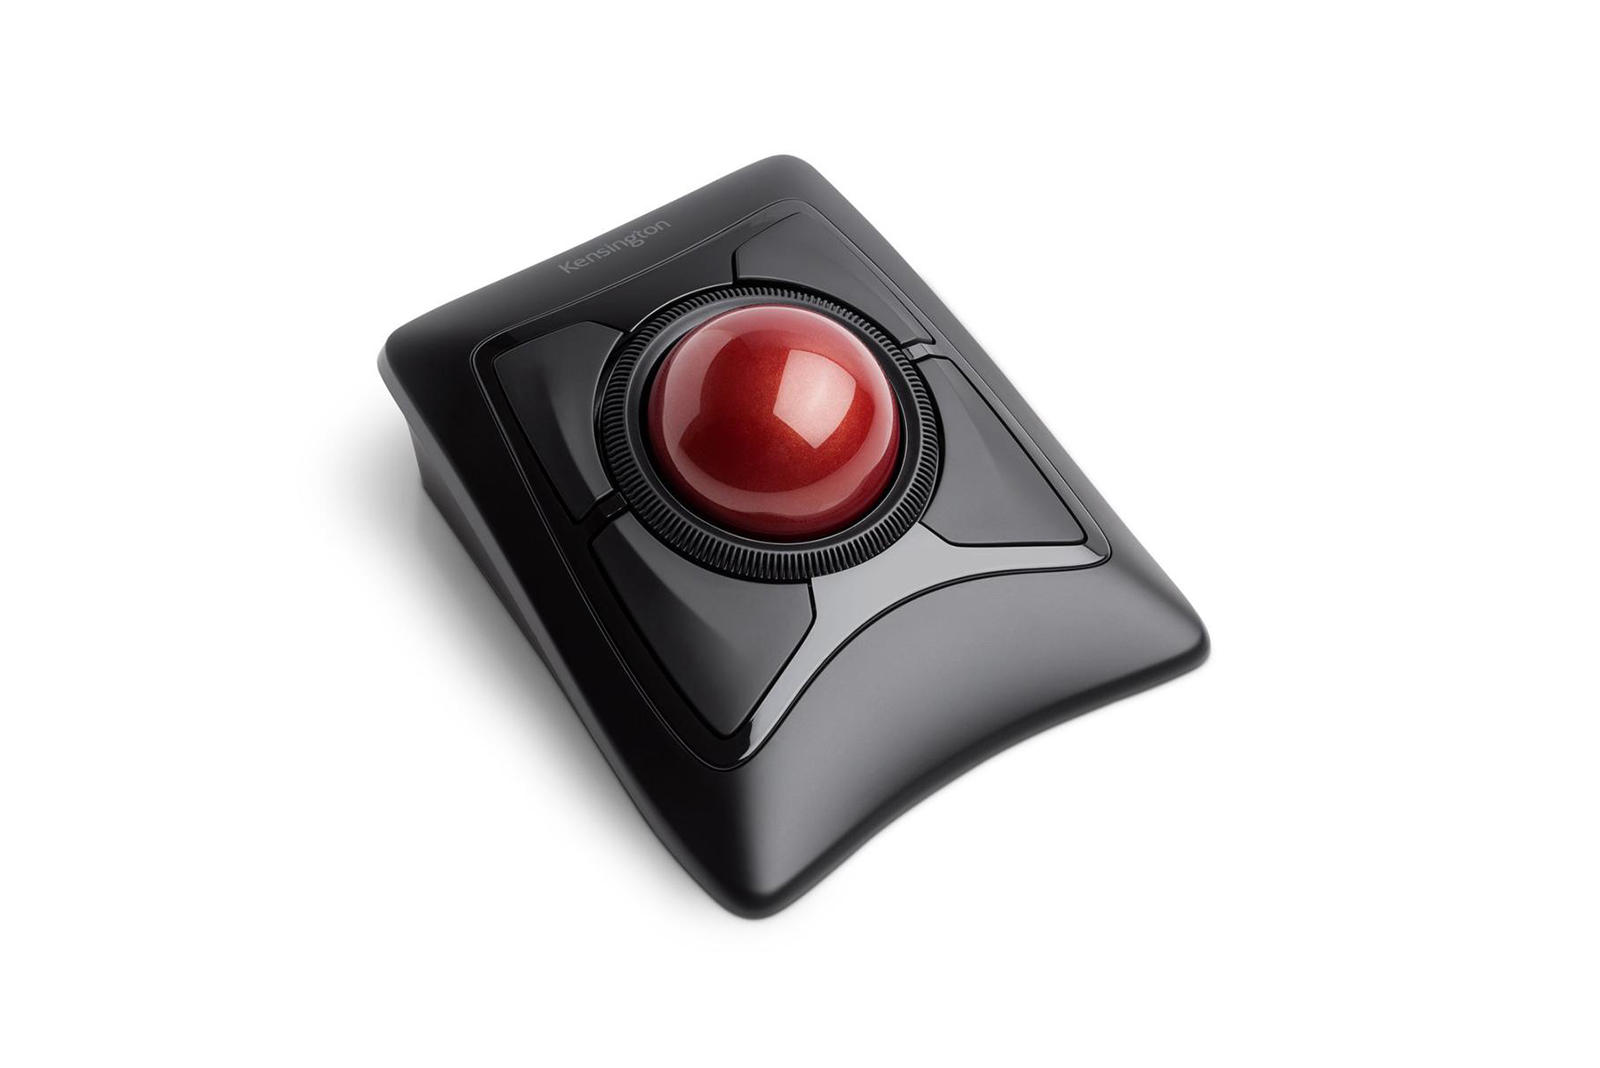 kensington-trackball.jpg